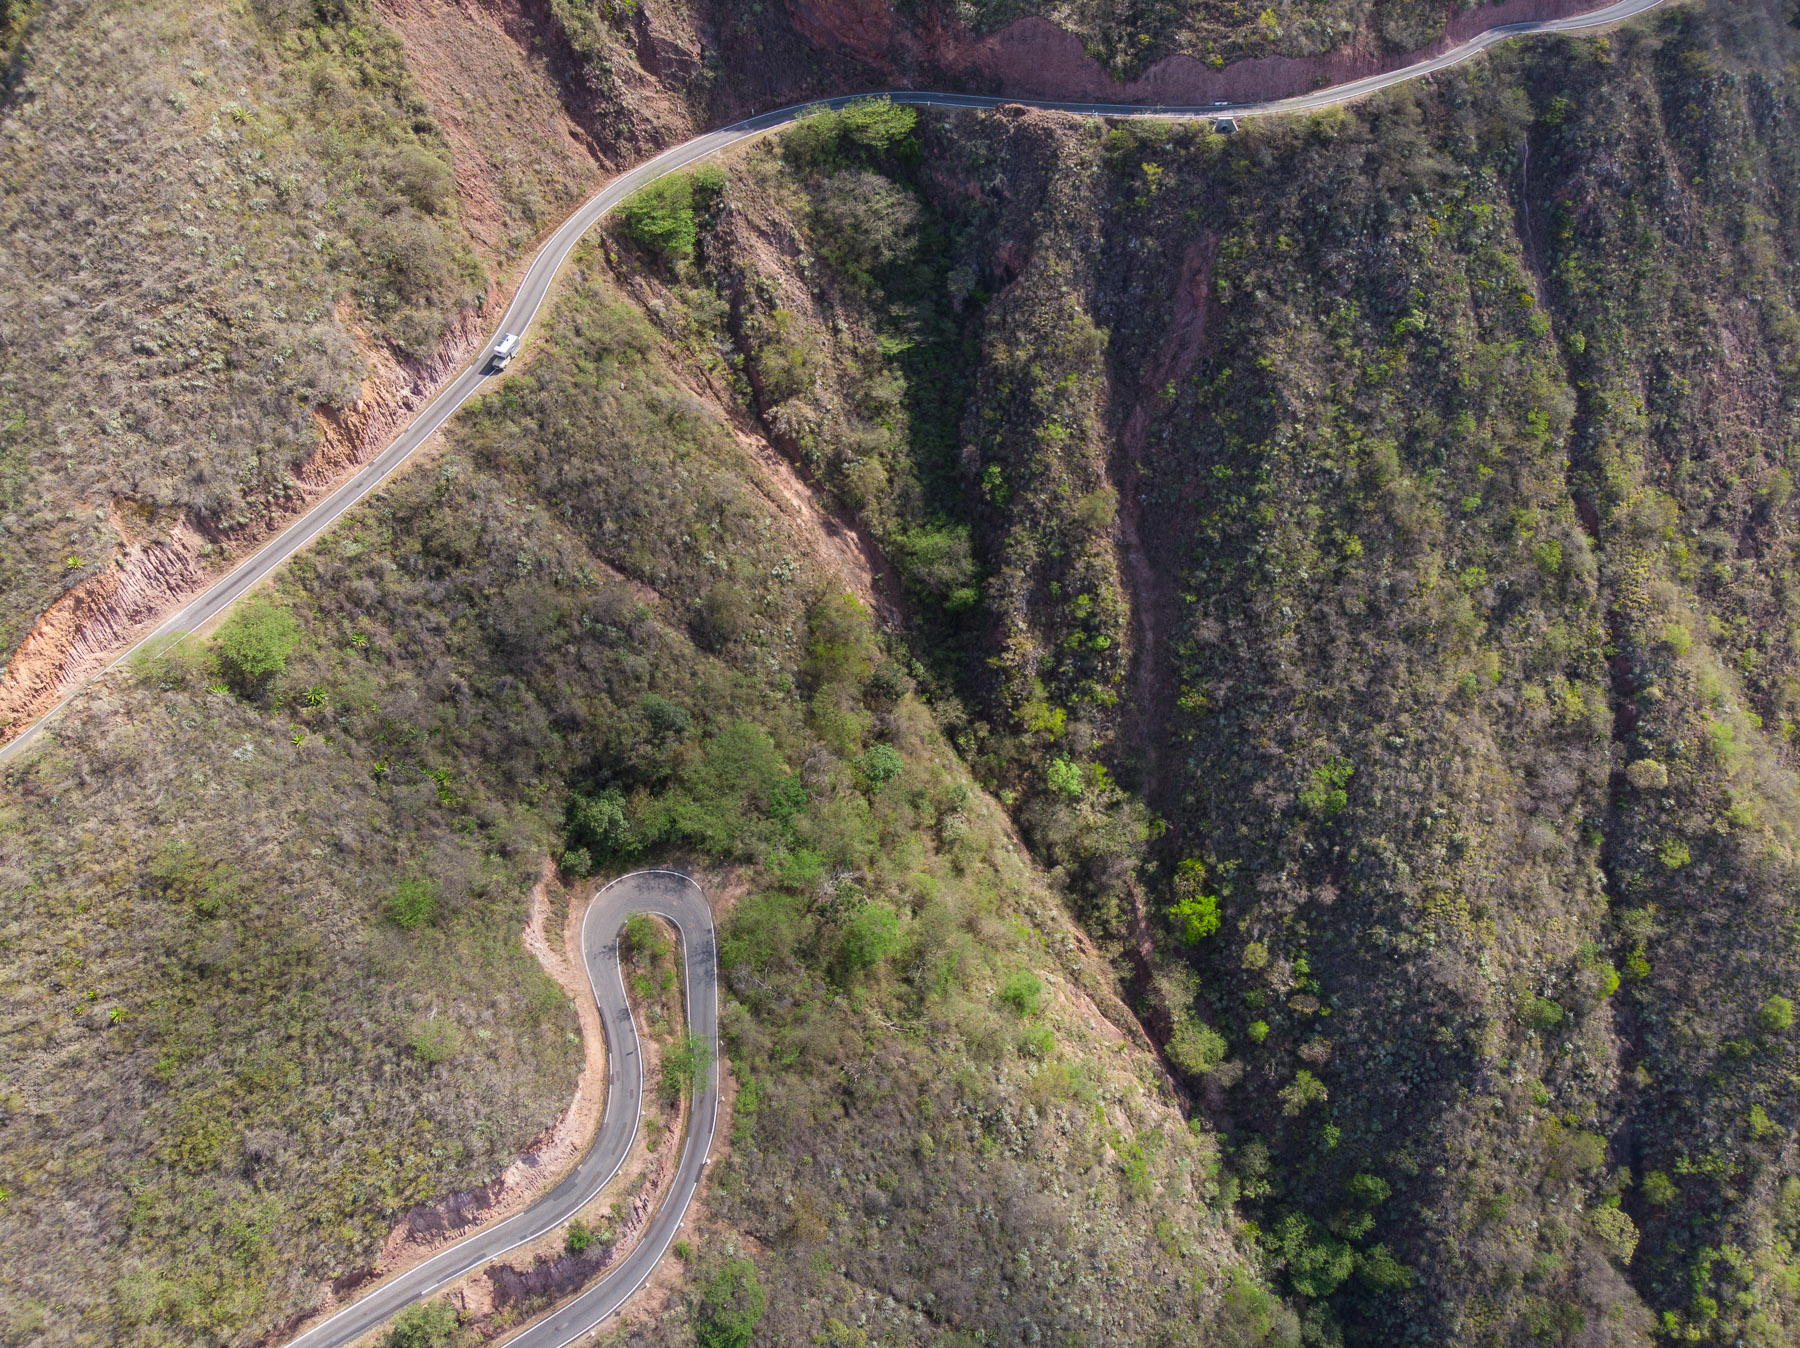 Abenteuerliche Straßen an steilen Berghängen